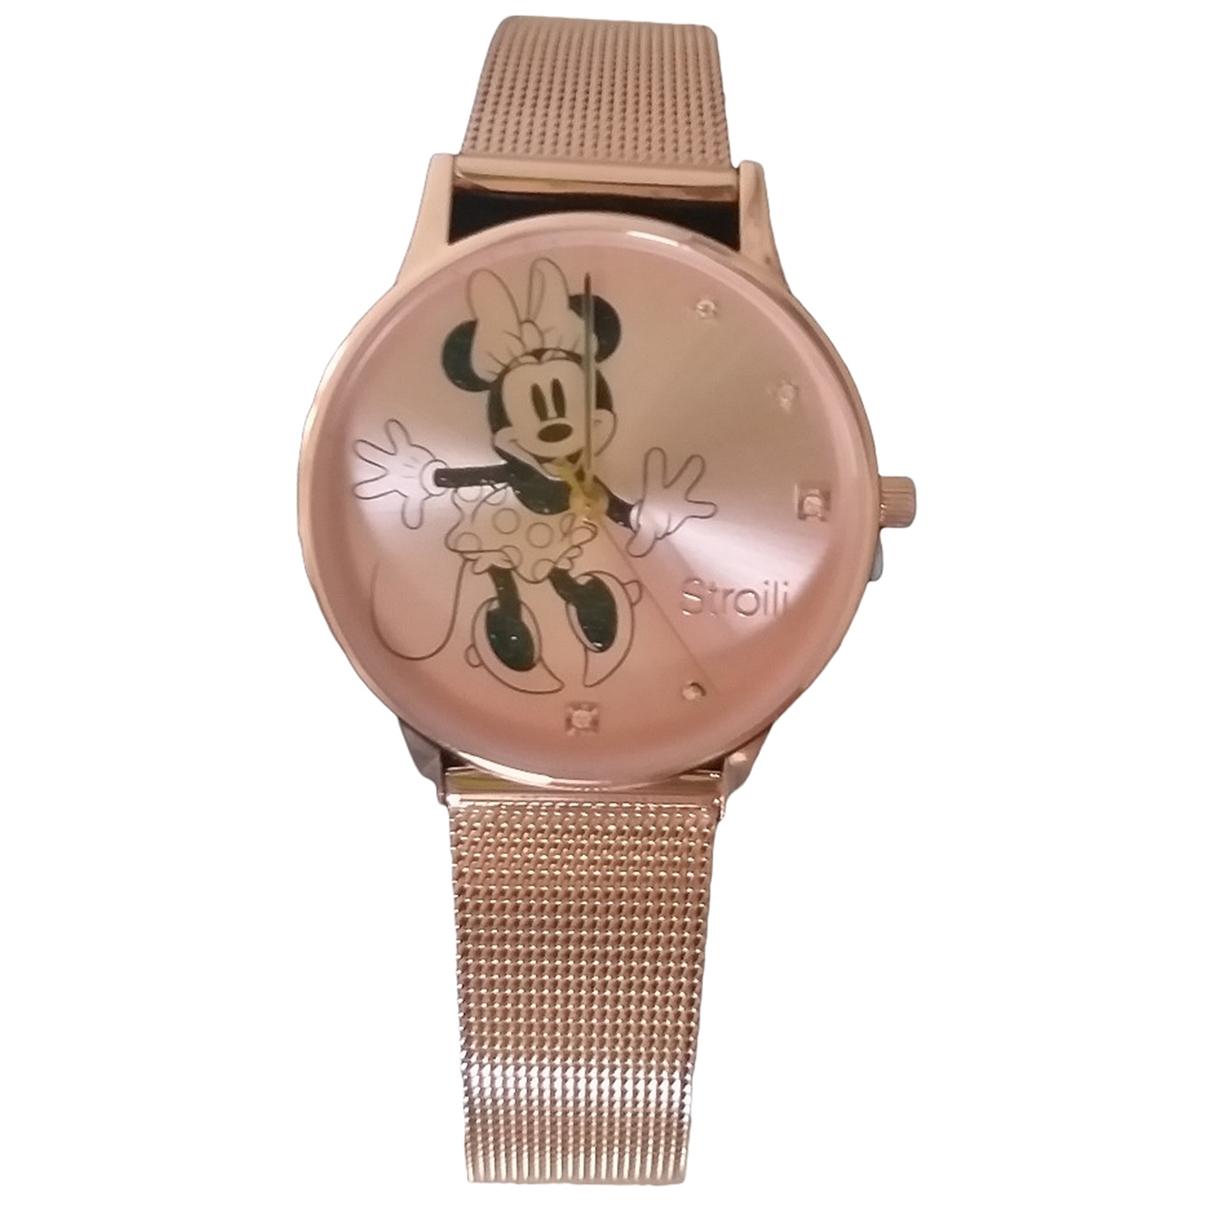 Stroili \N Pink Steel watch for Women \N